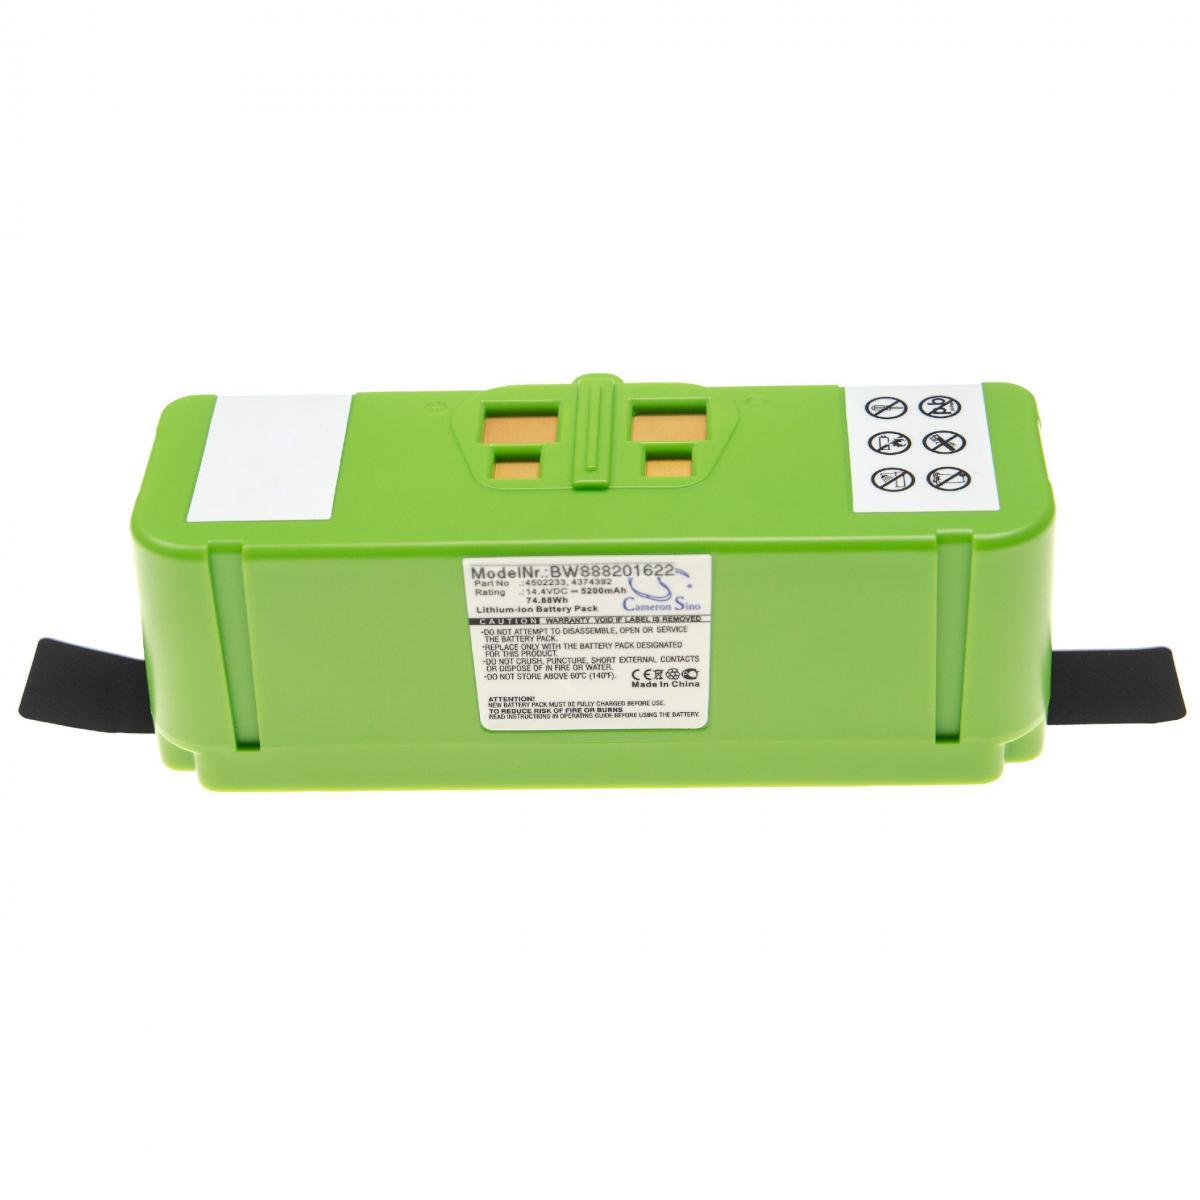 Vhbw vhbw batterie compatible avec iRobot Roomba 614, 615, 640, 652, 665, 670, 671, 675 robot électroménager (5200mAh, 14,4V,